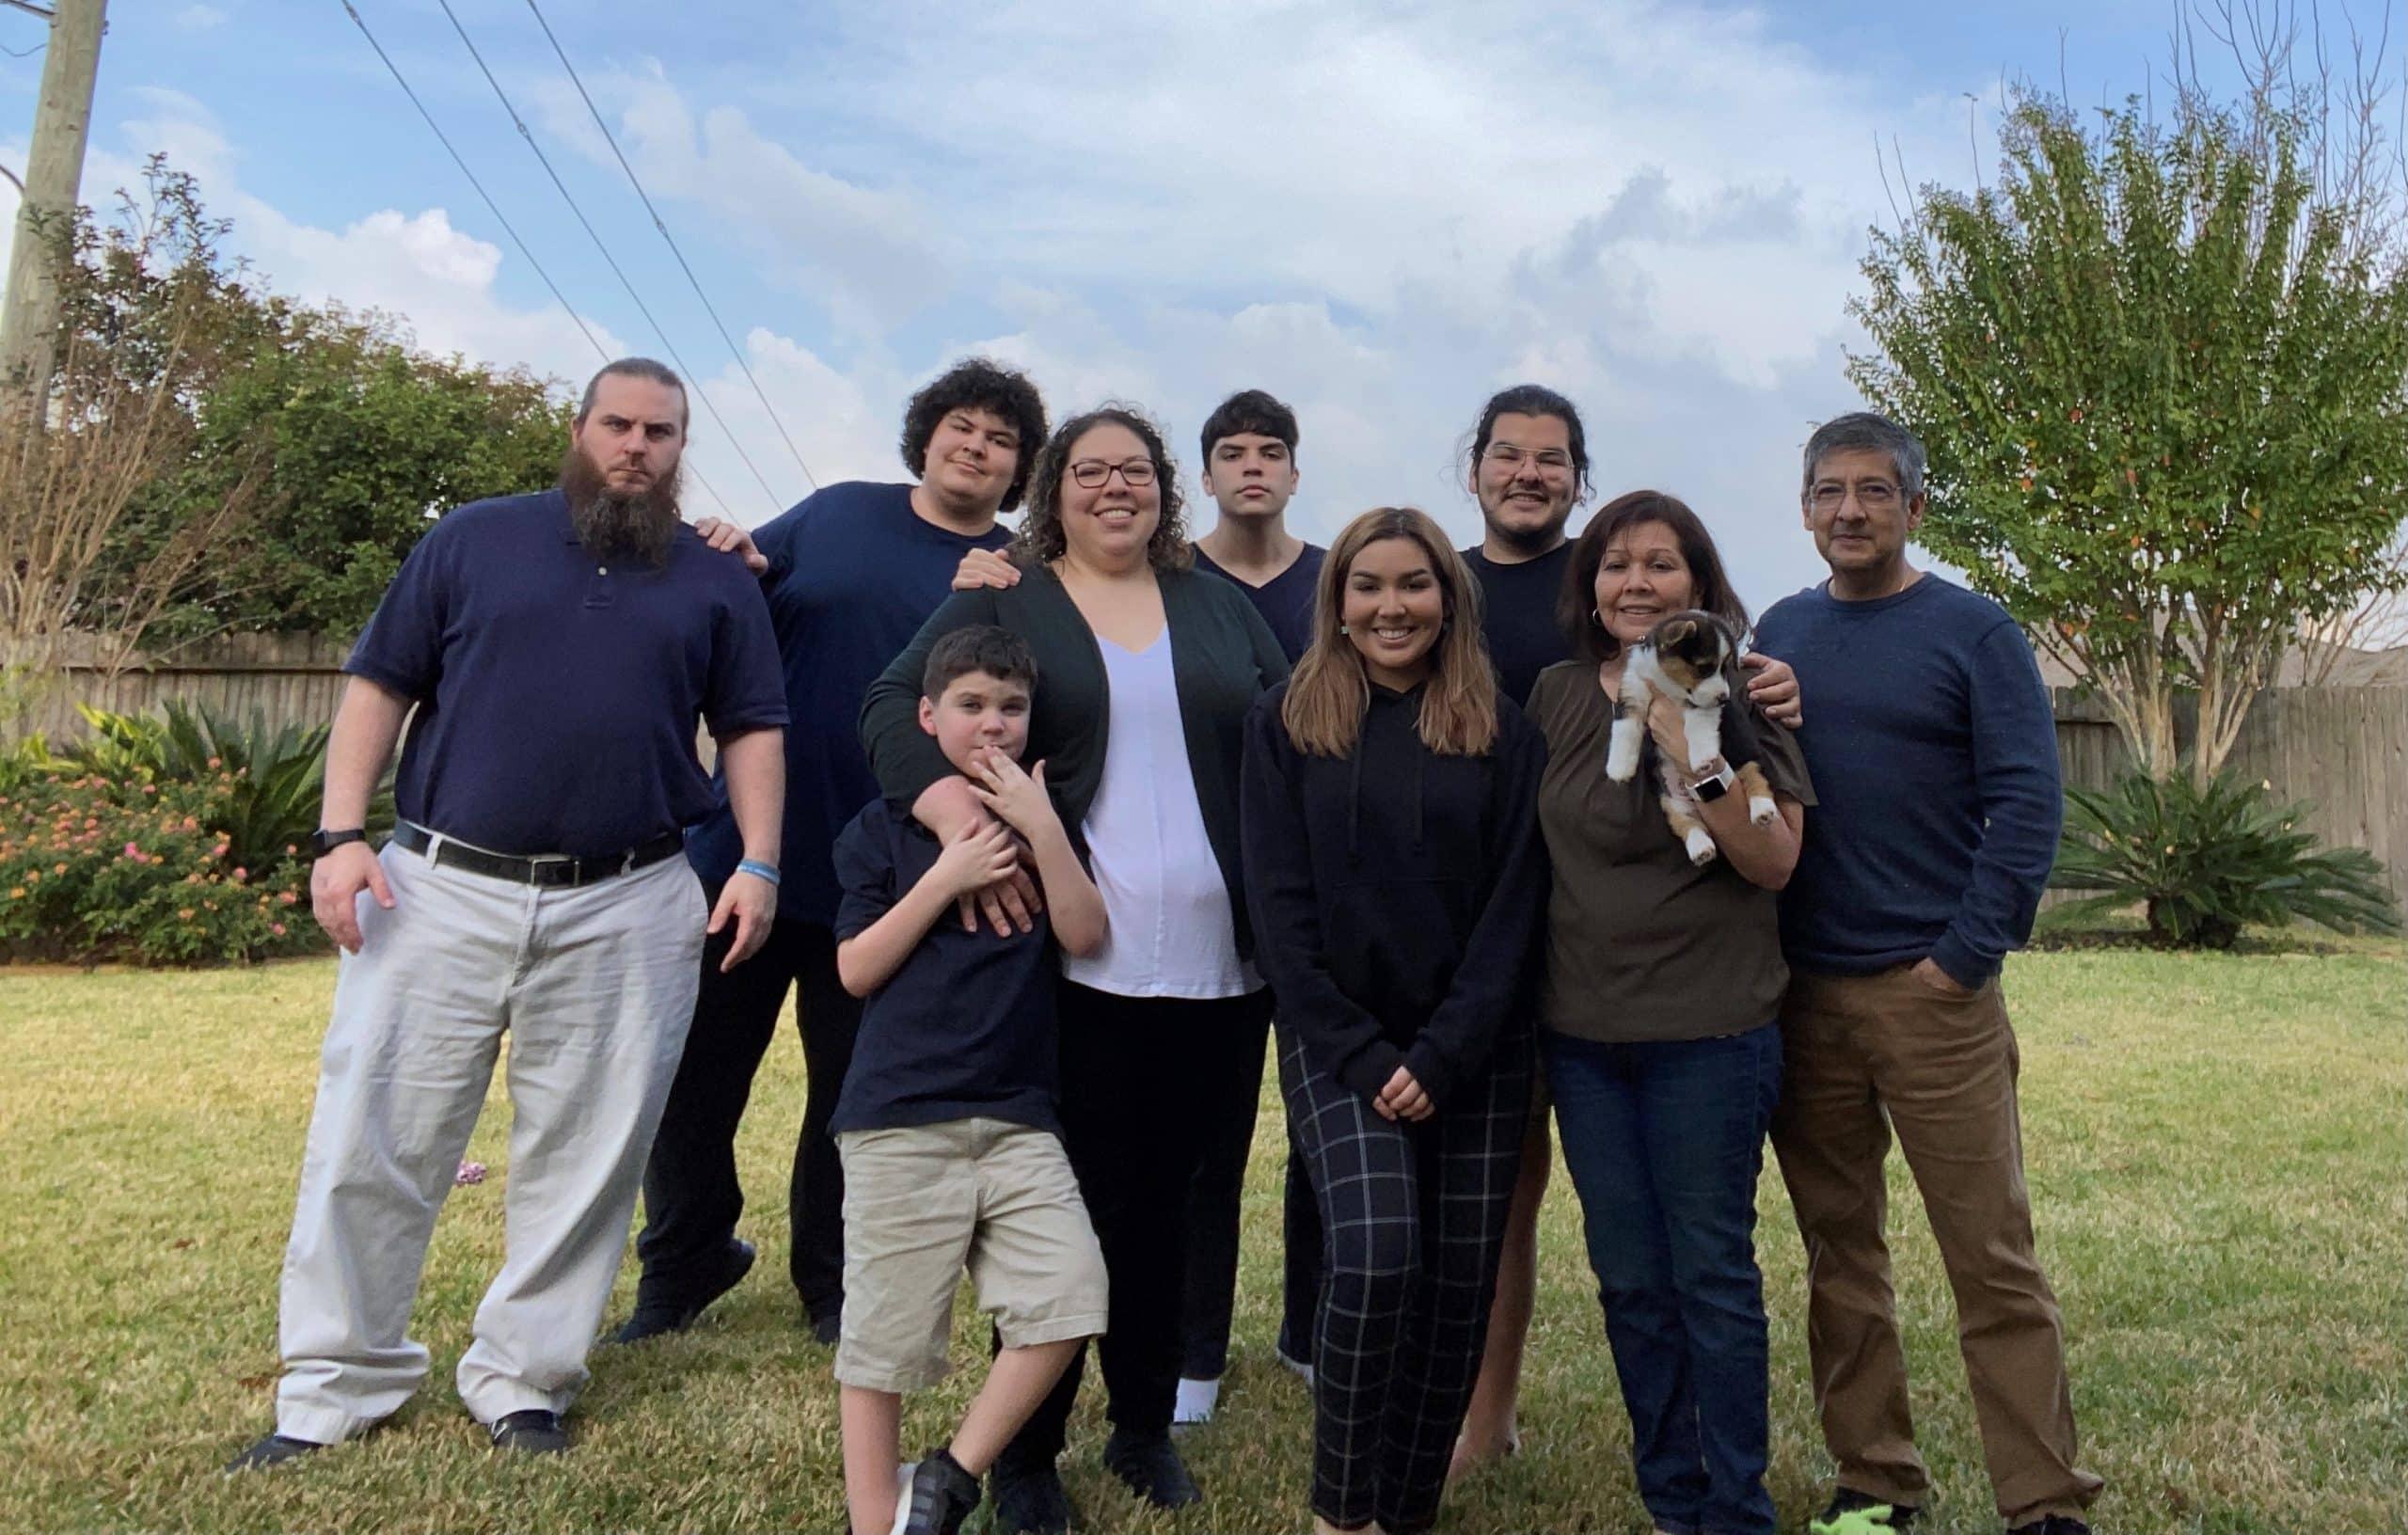 Samantha Leos and family